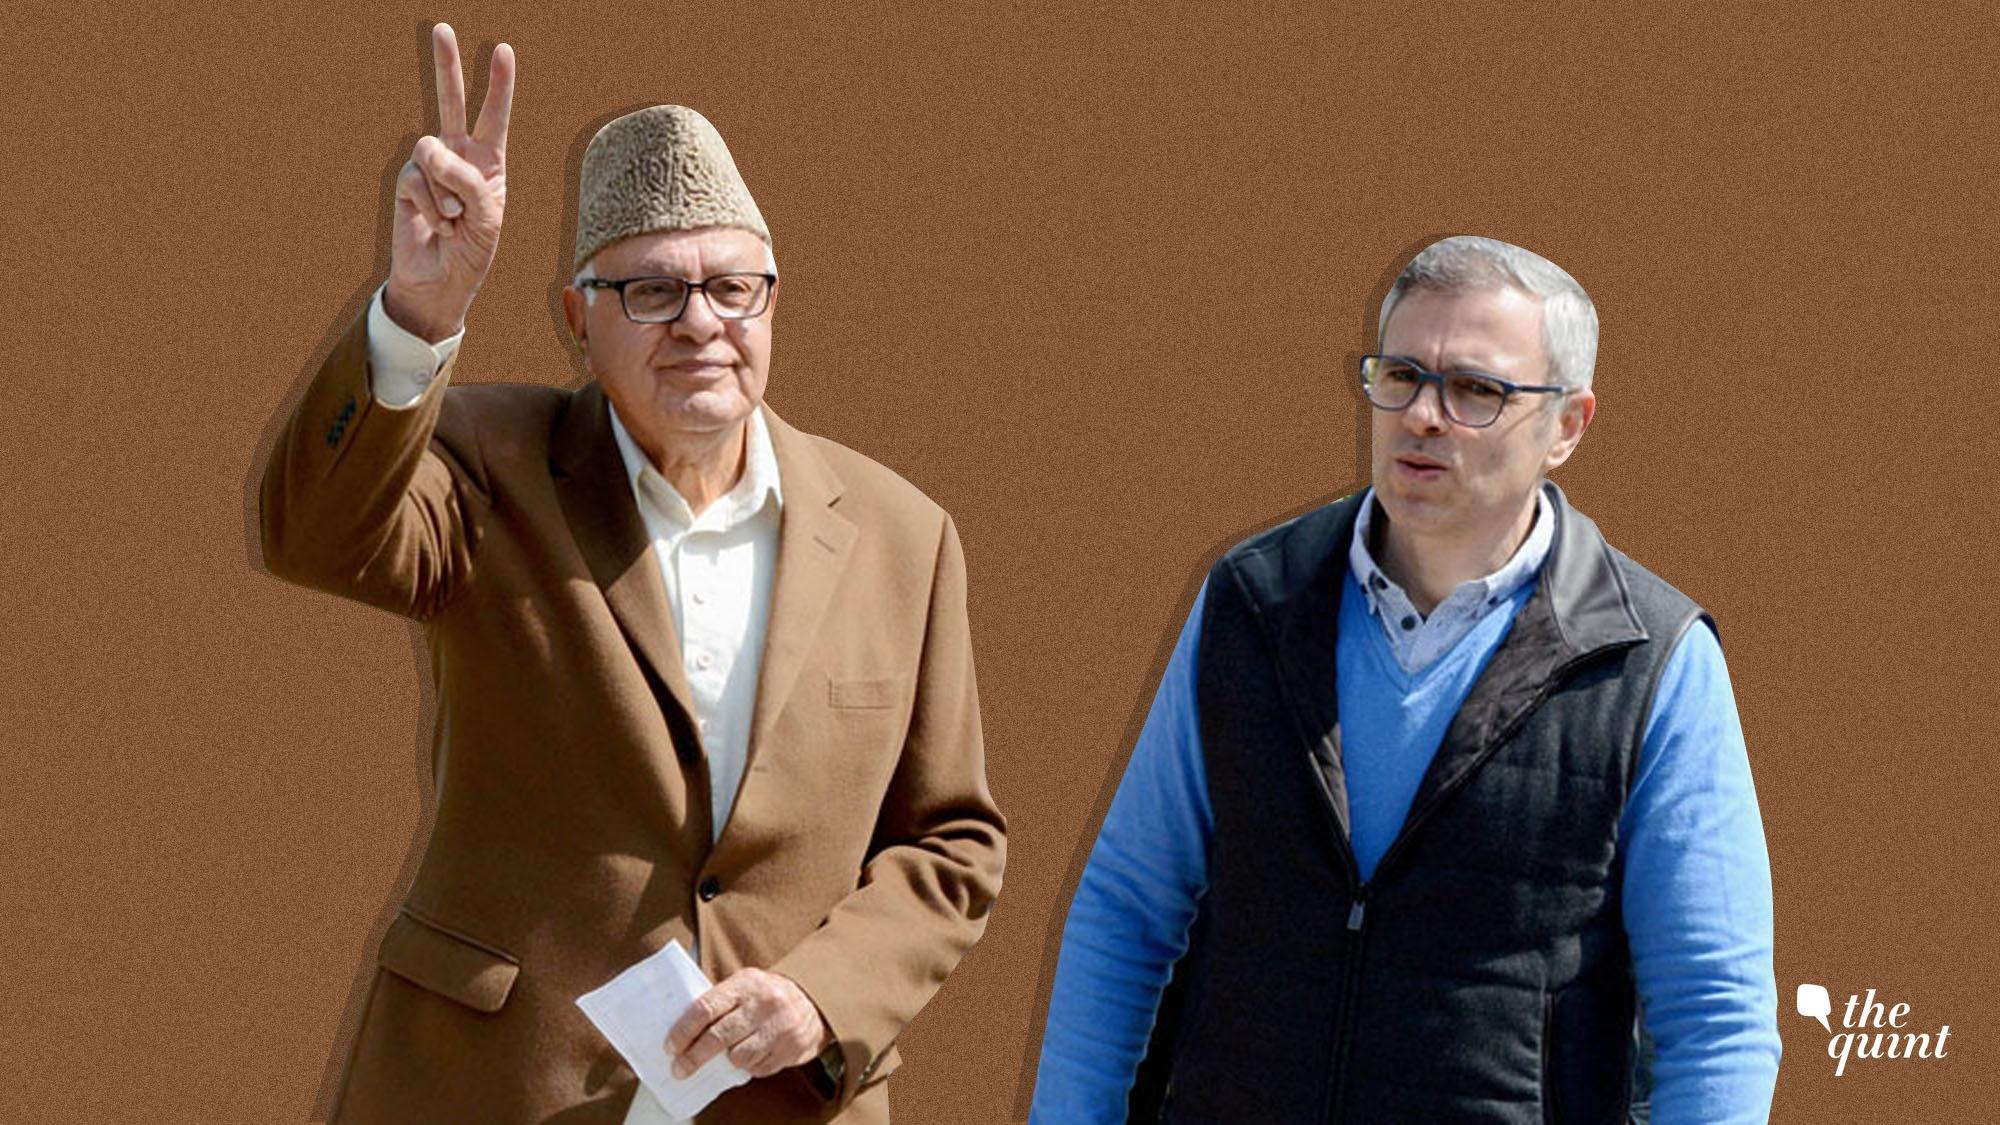 NC Chief Farooq Abdullah Wins Srinagar Seat by Over 70,000 Votes